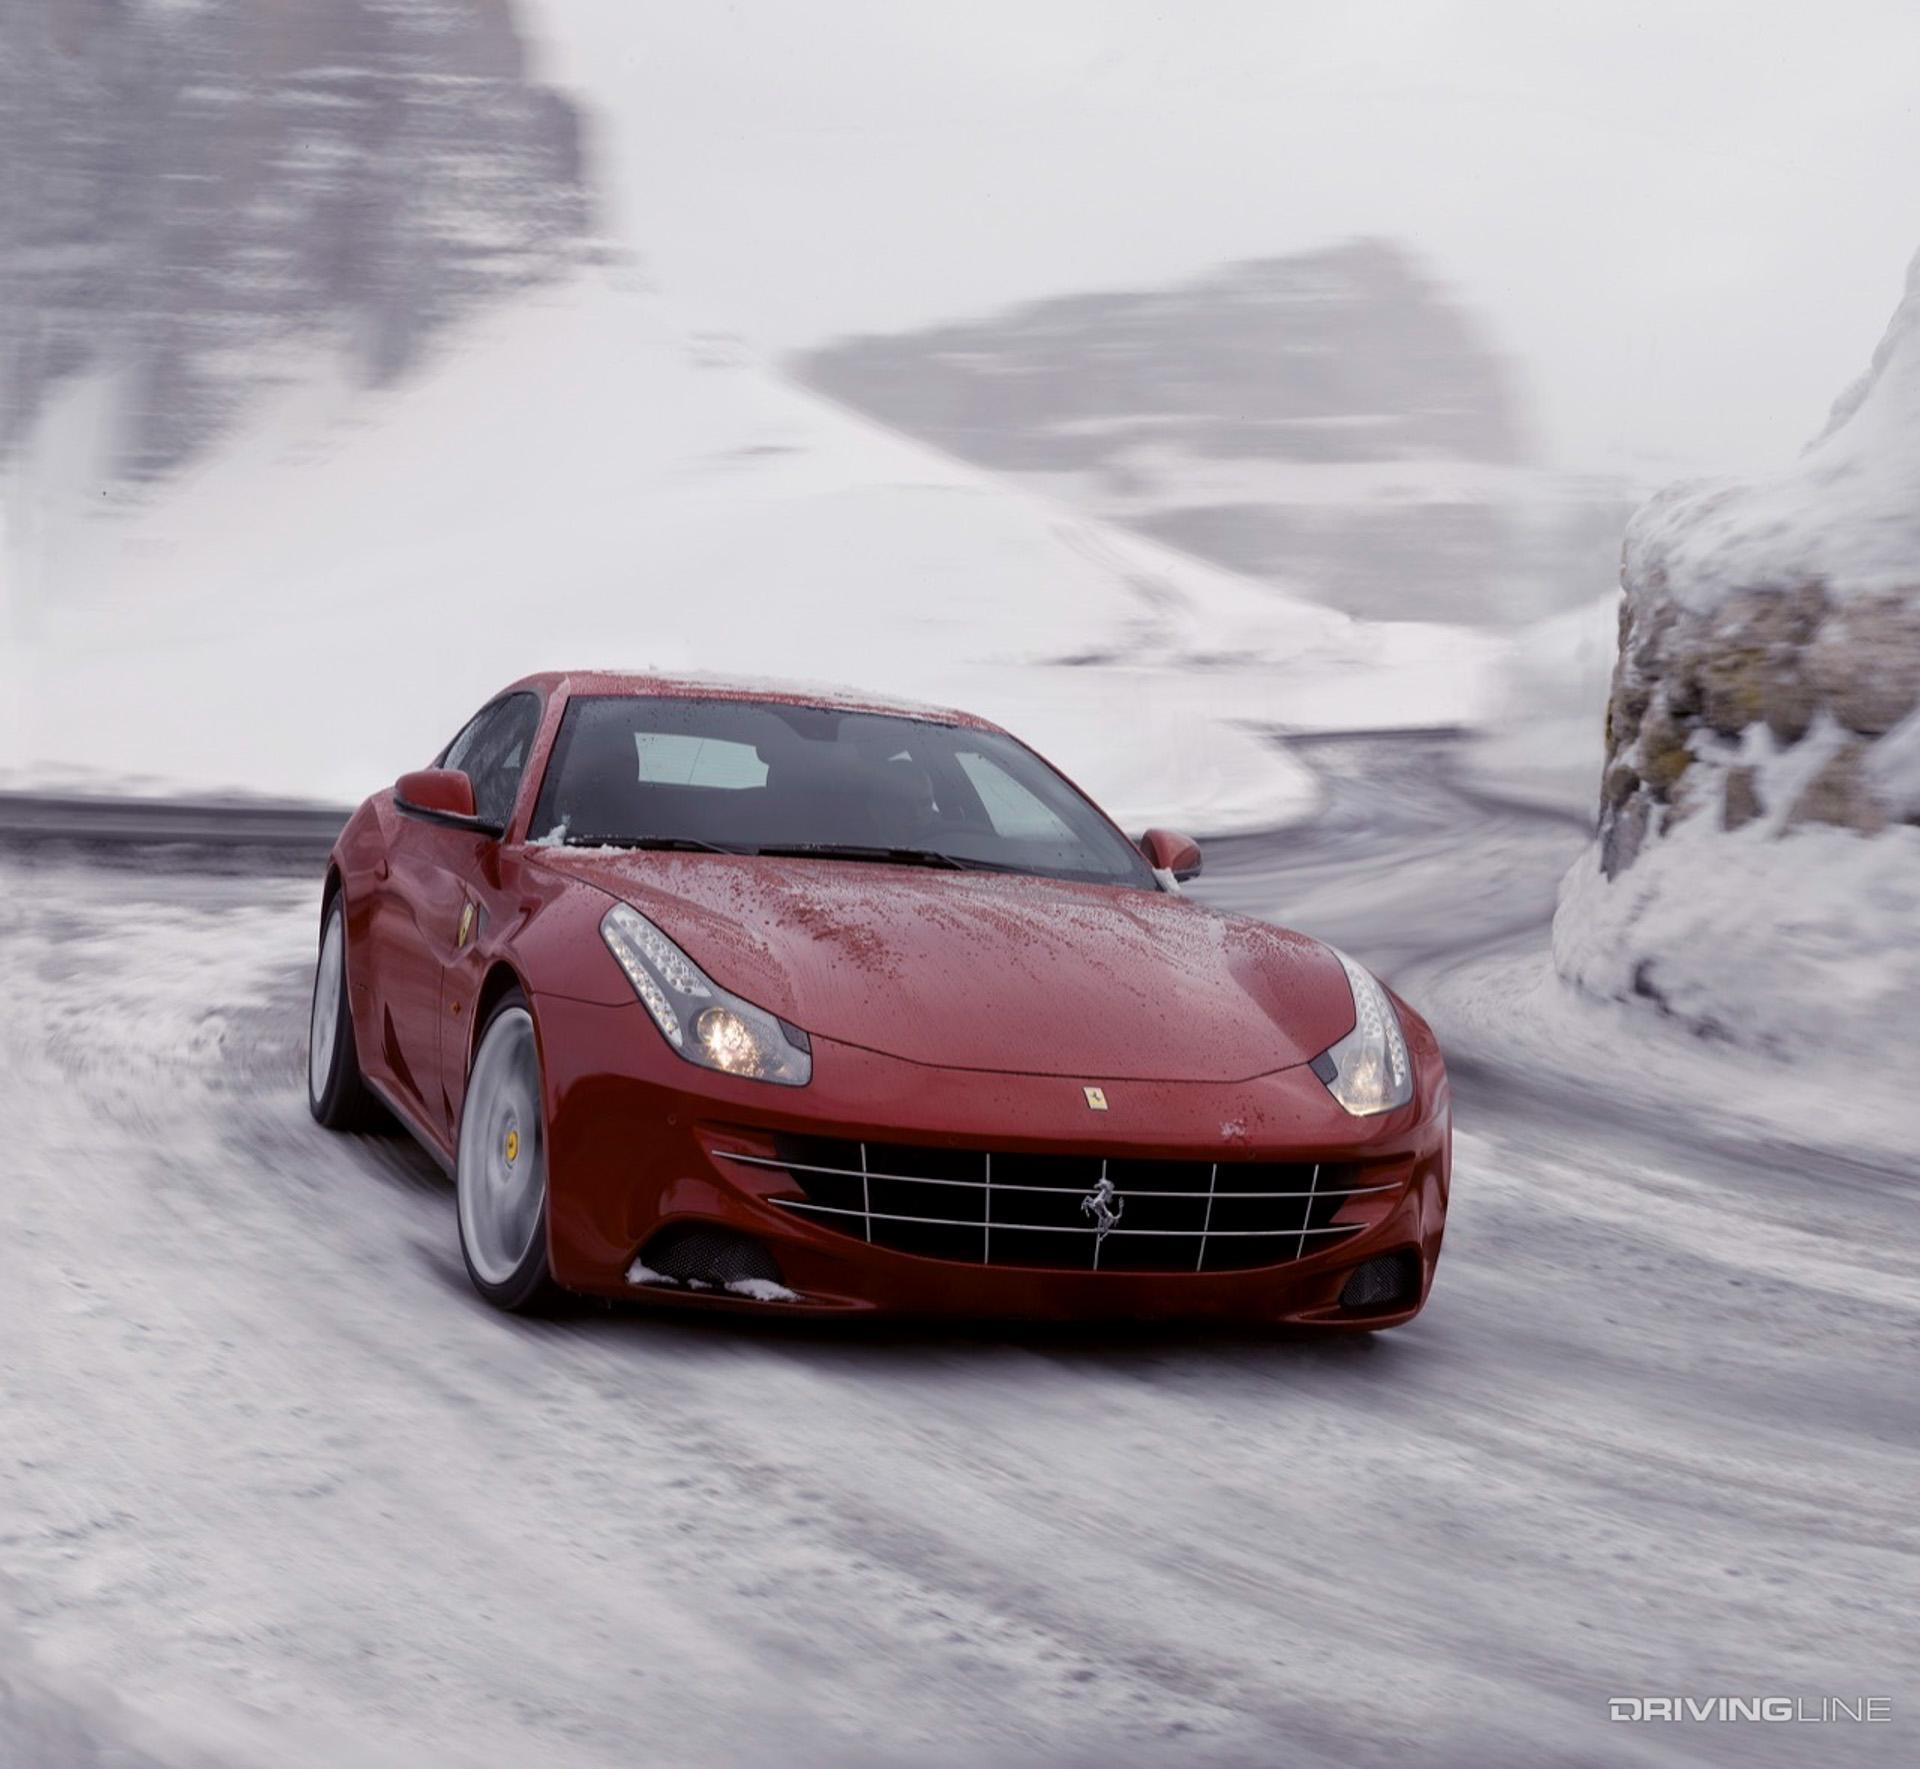 Ferrari 4x4: 10 Winter-Ready Vehicles To Dominate Snow-Filled Roads